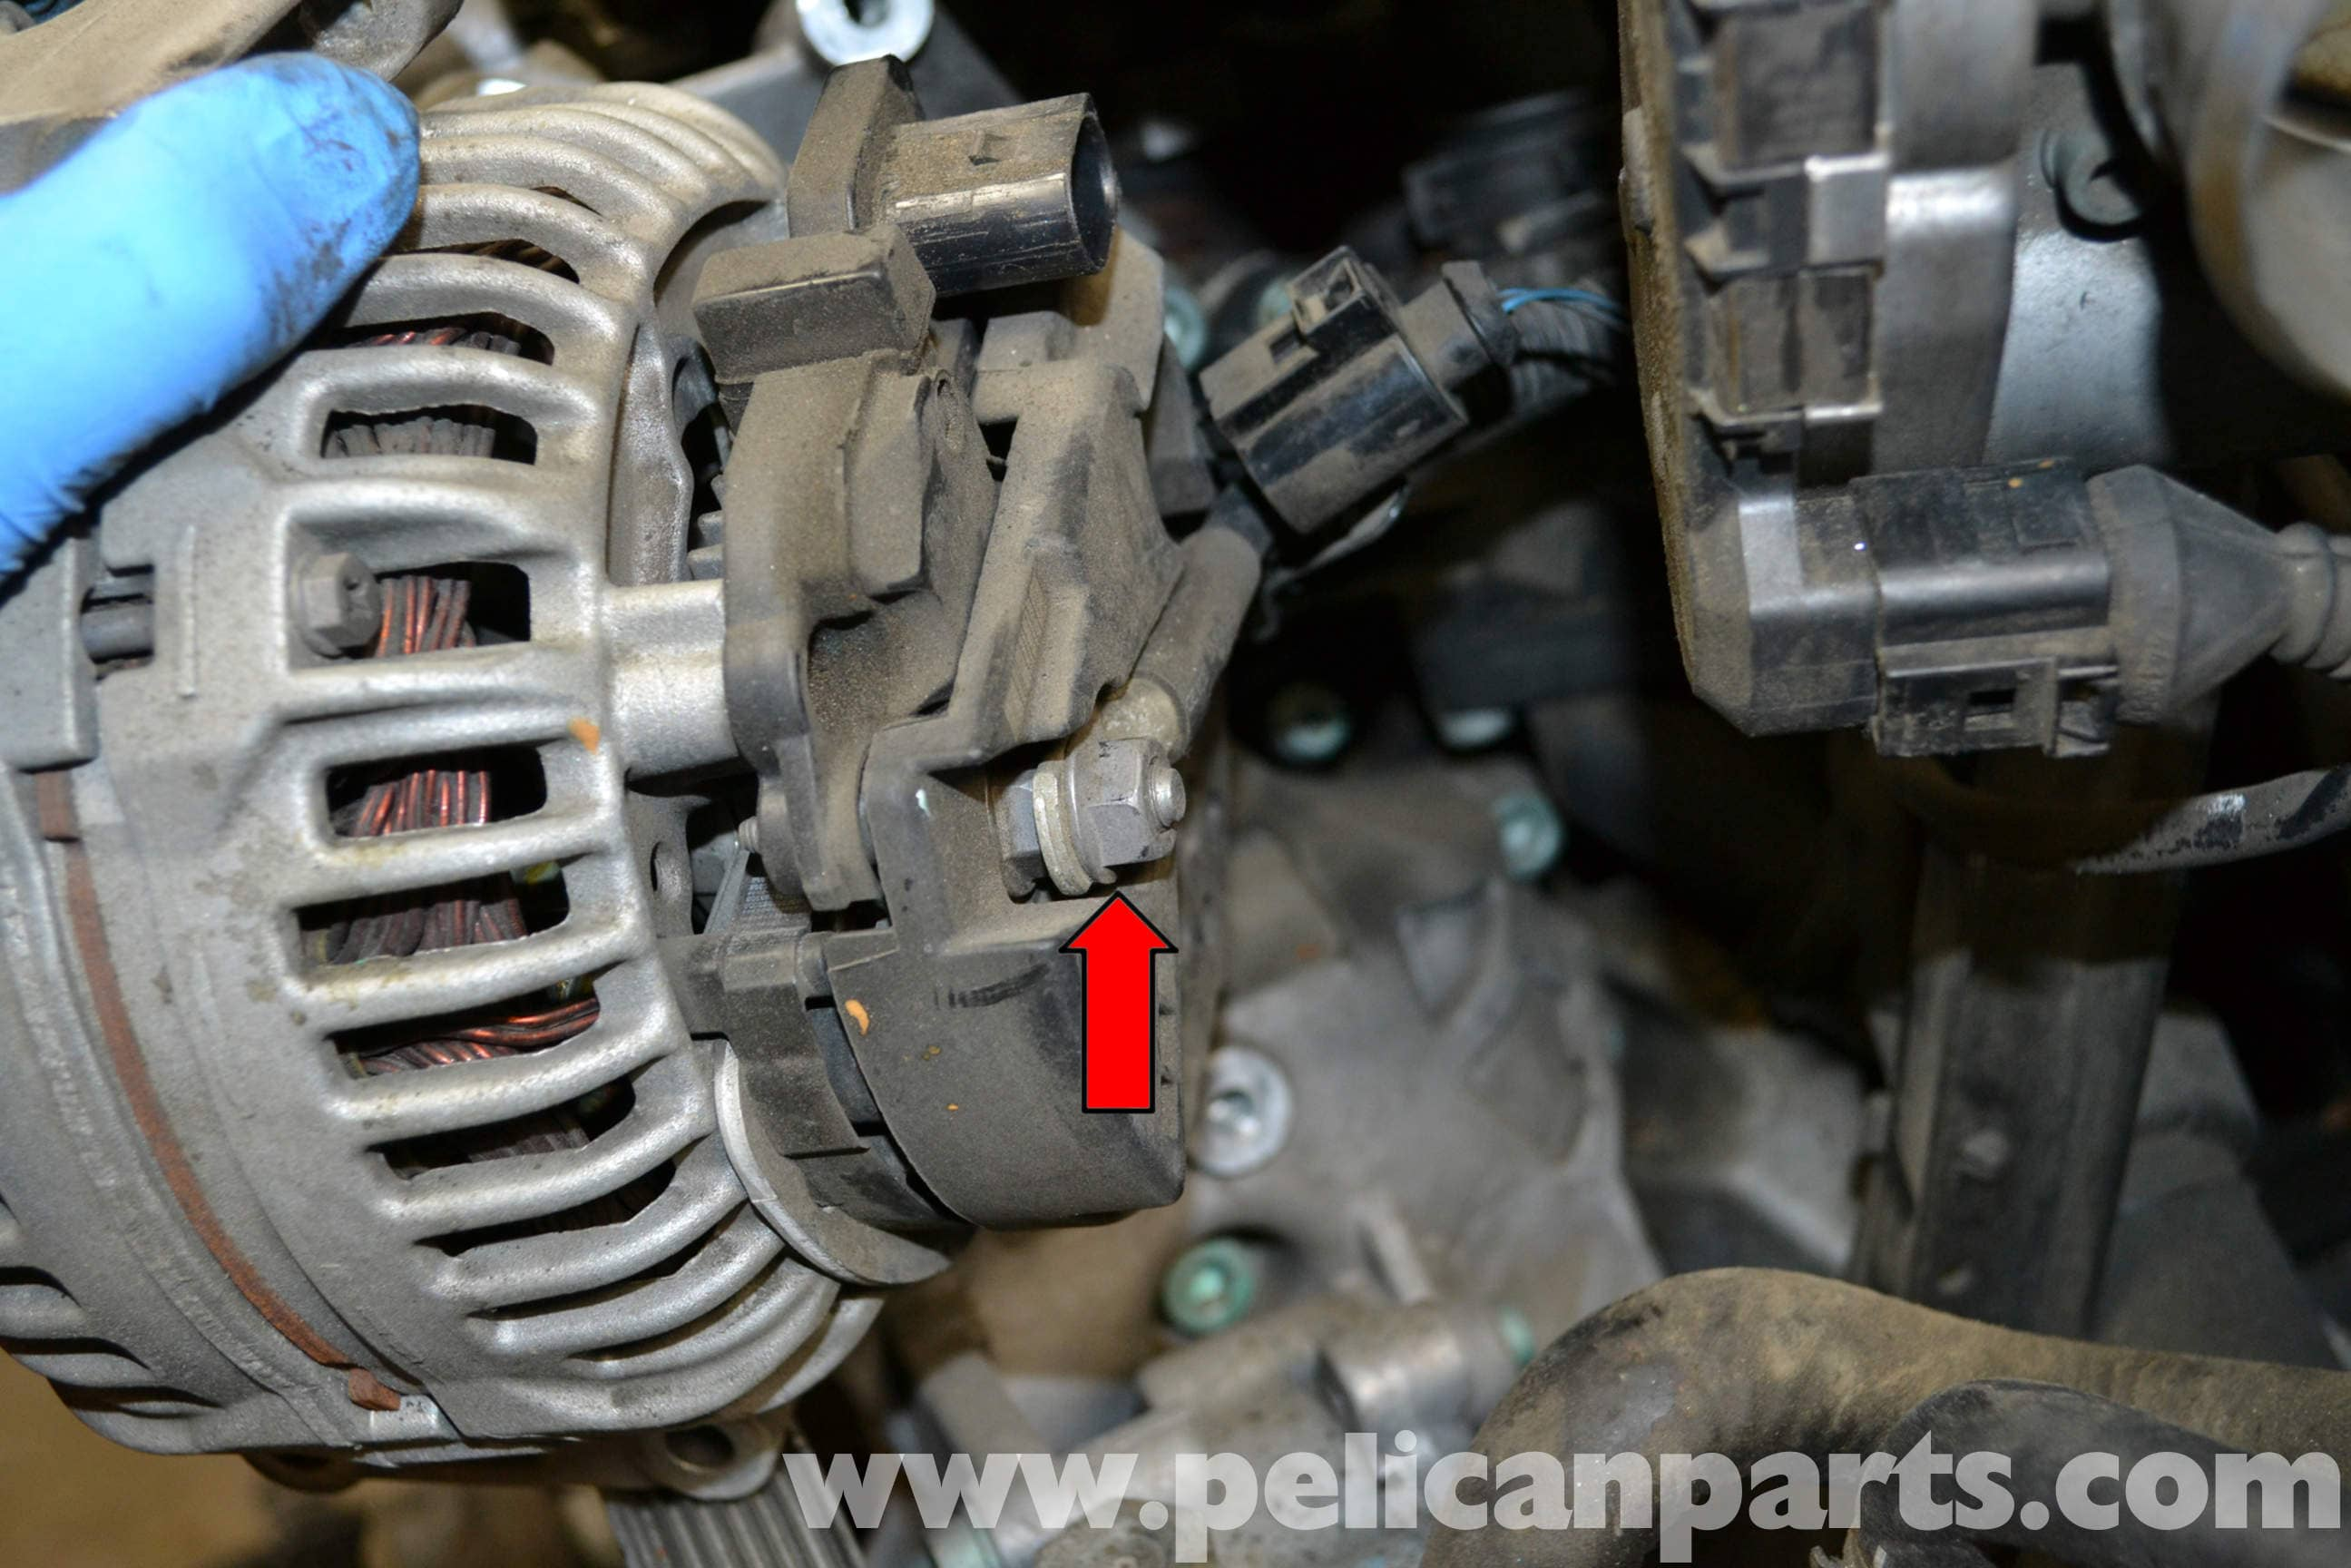 Audi A4 B6 Alternator Replacement  1 8t 2002